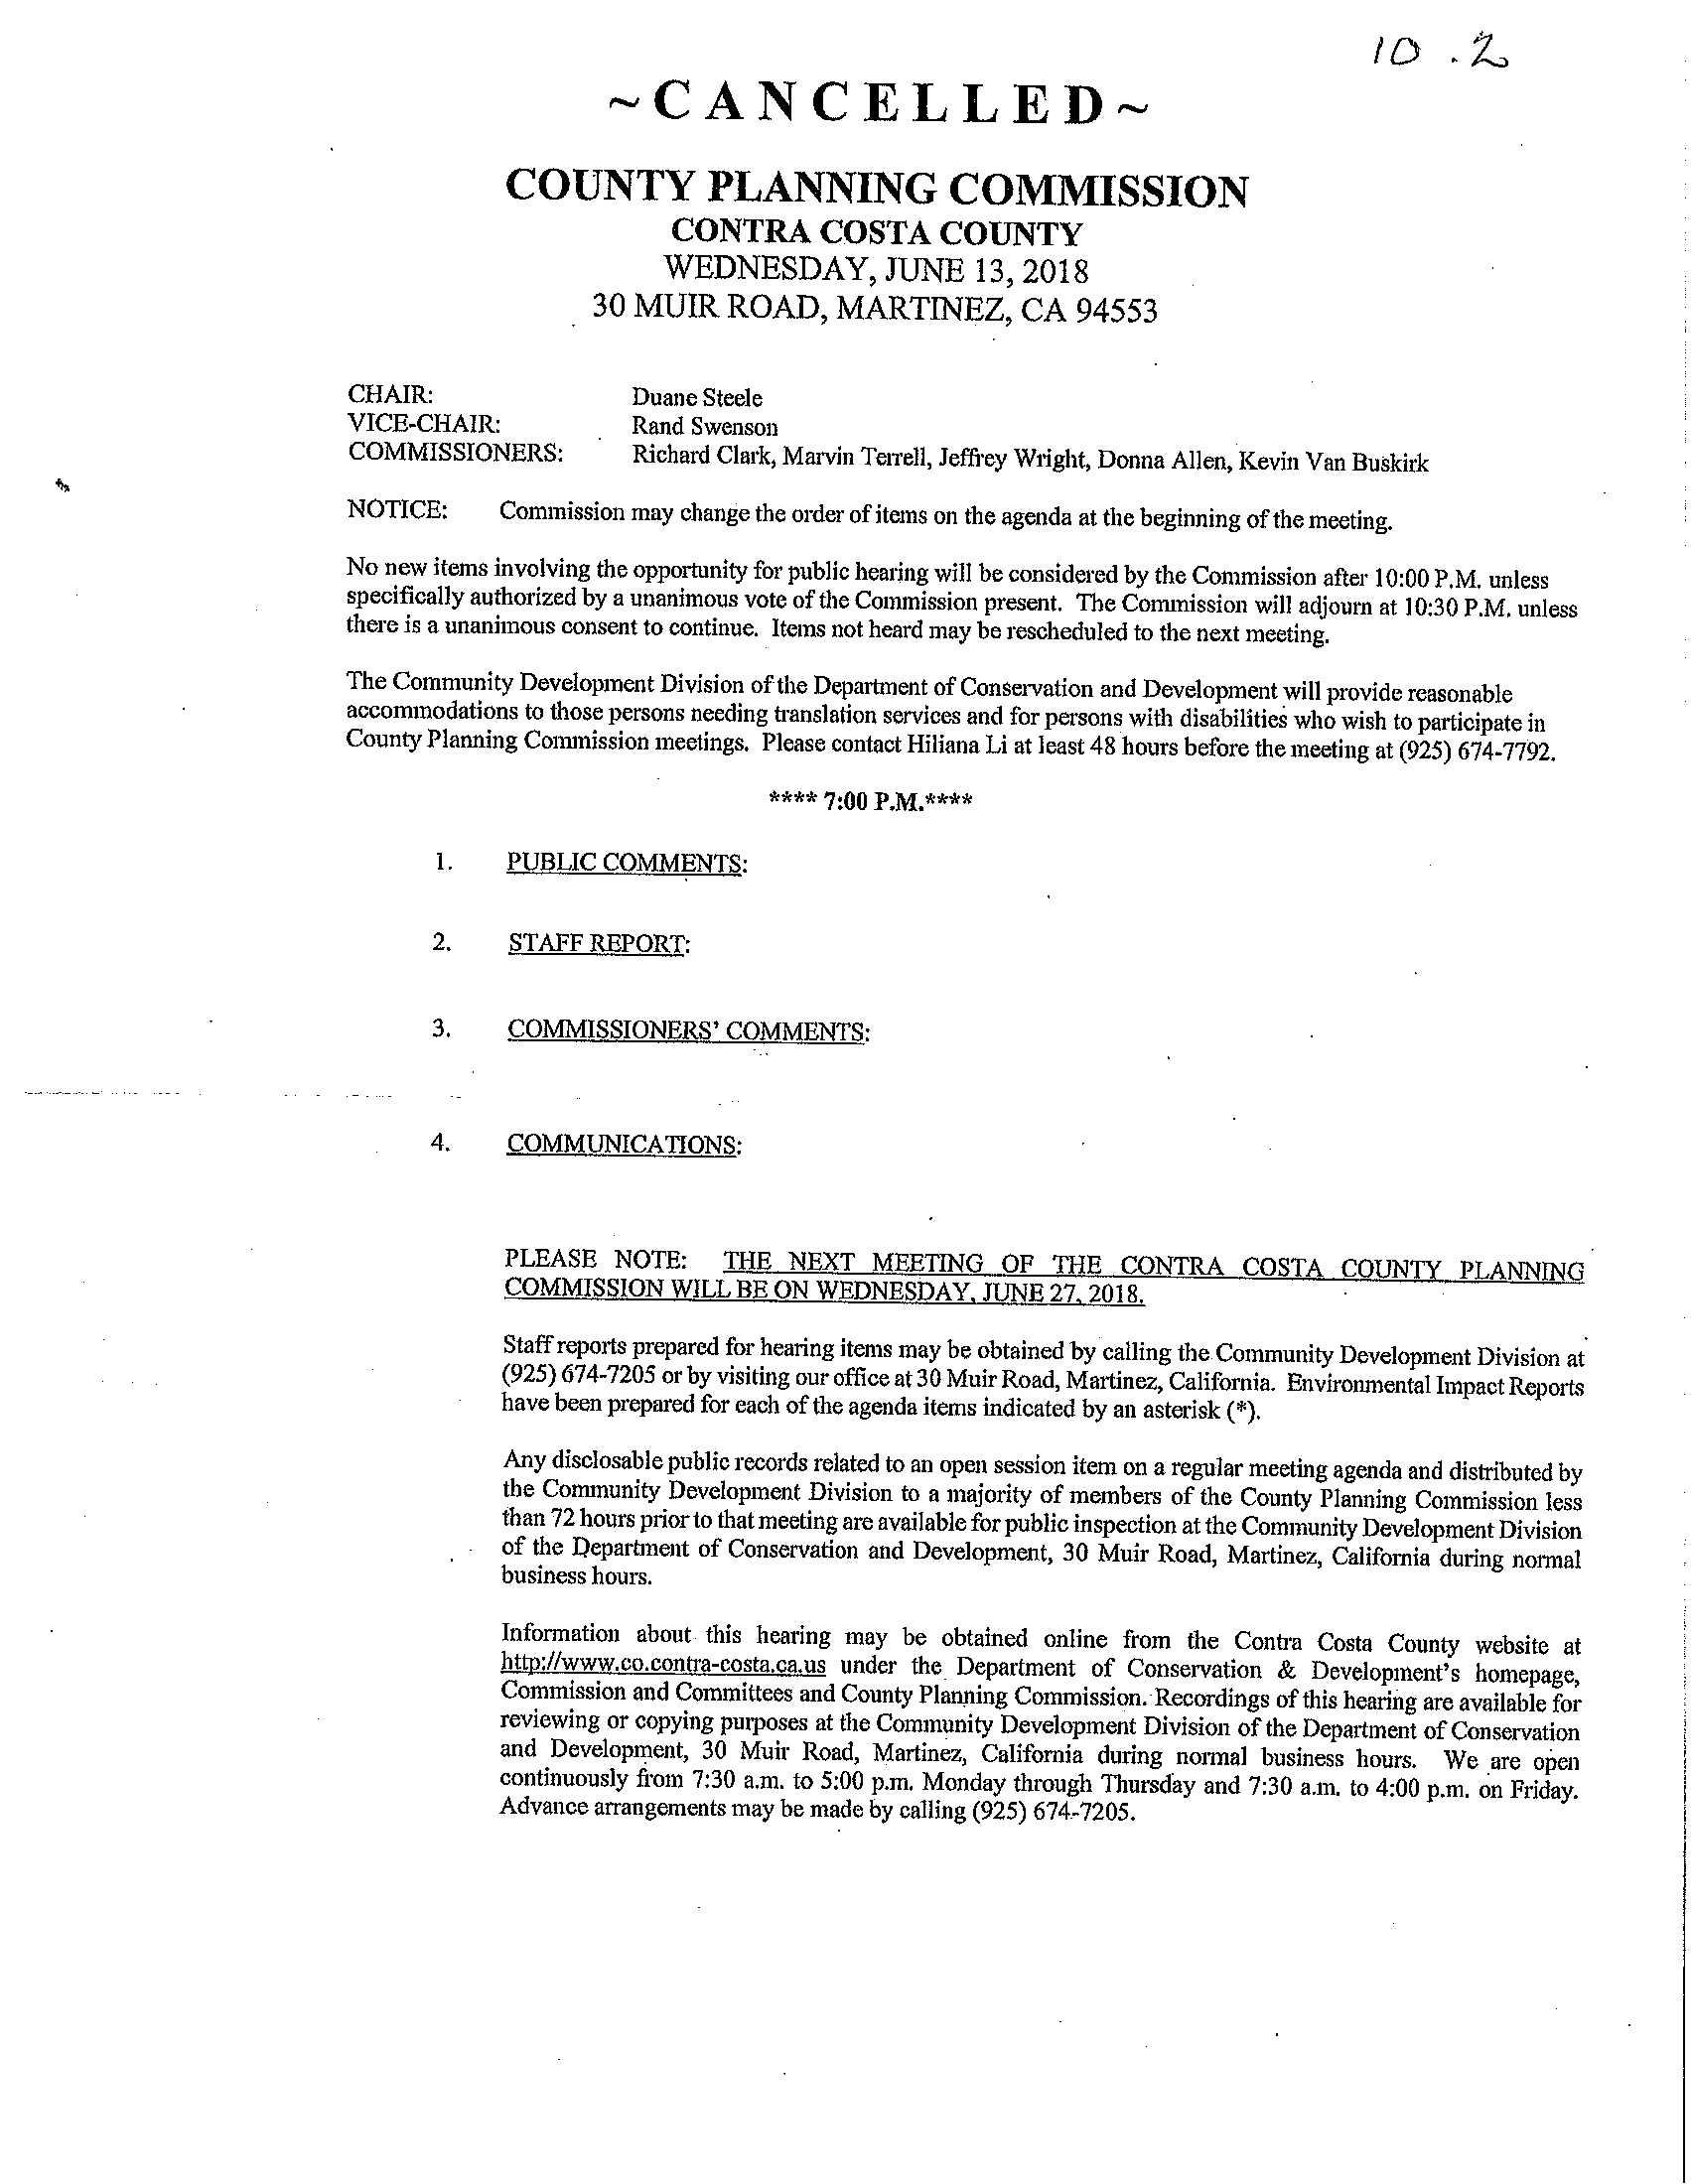 ESMAC Agenda 6.13.2018 (30 Pages)_15.jpg